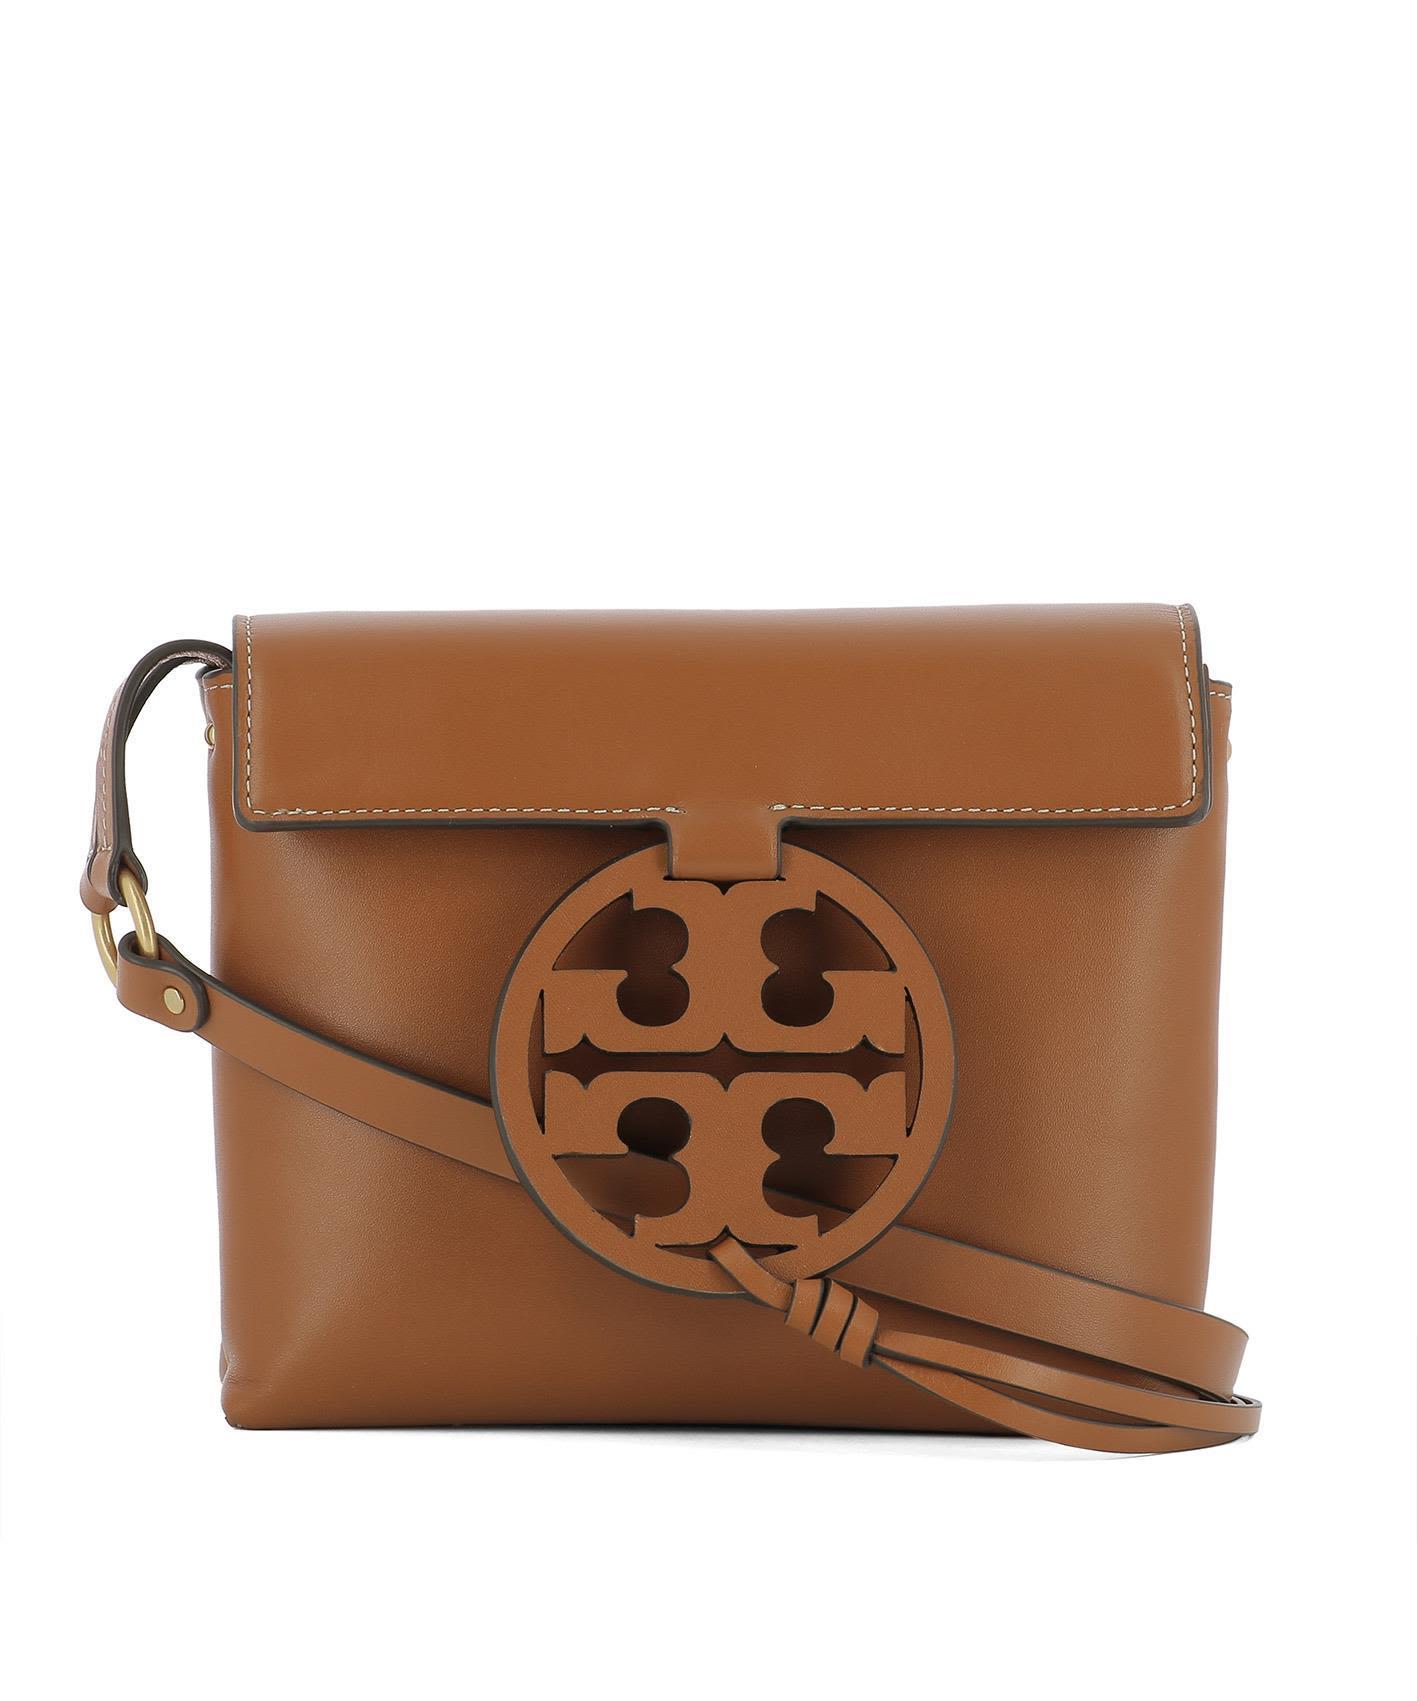 Tory Burch Brown Leather Shoulder Bag